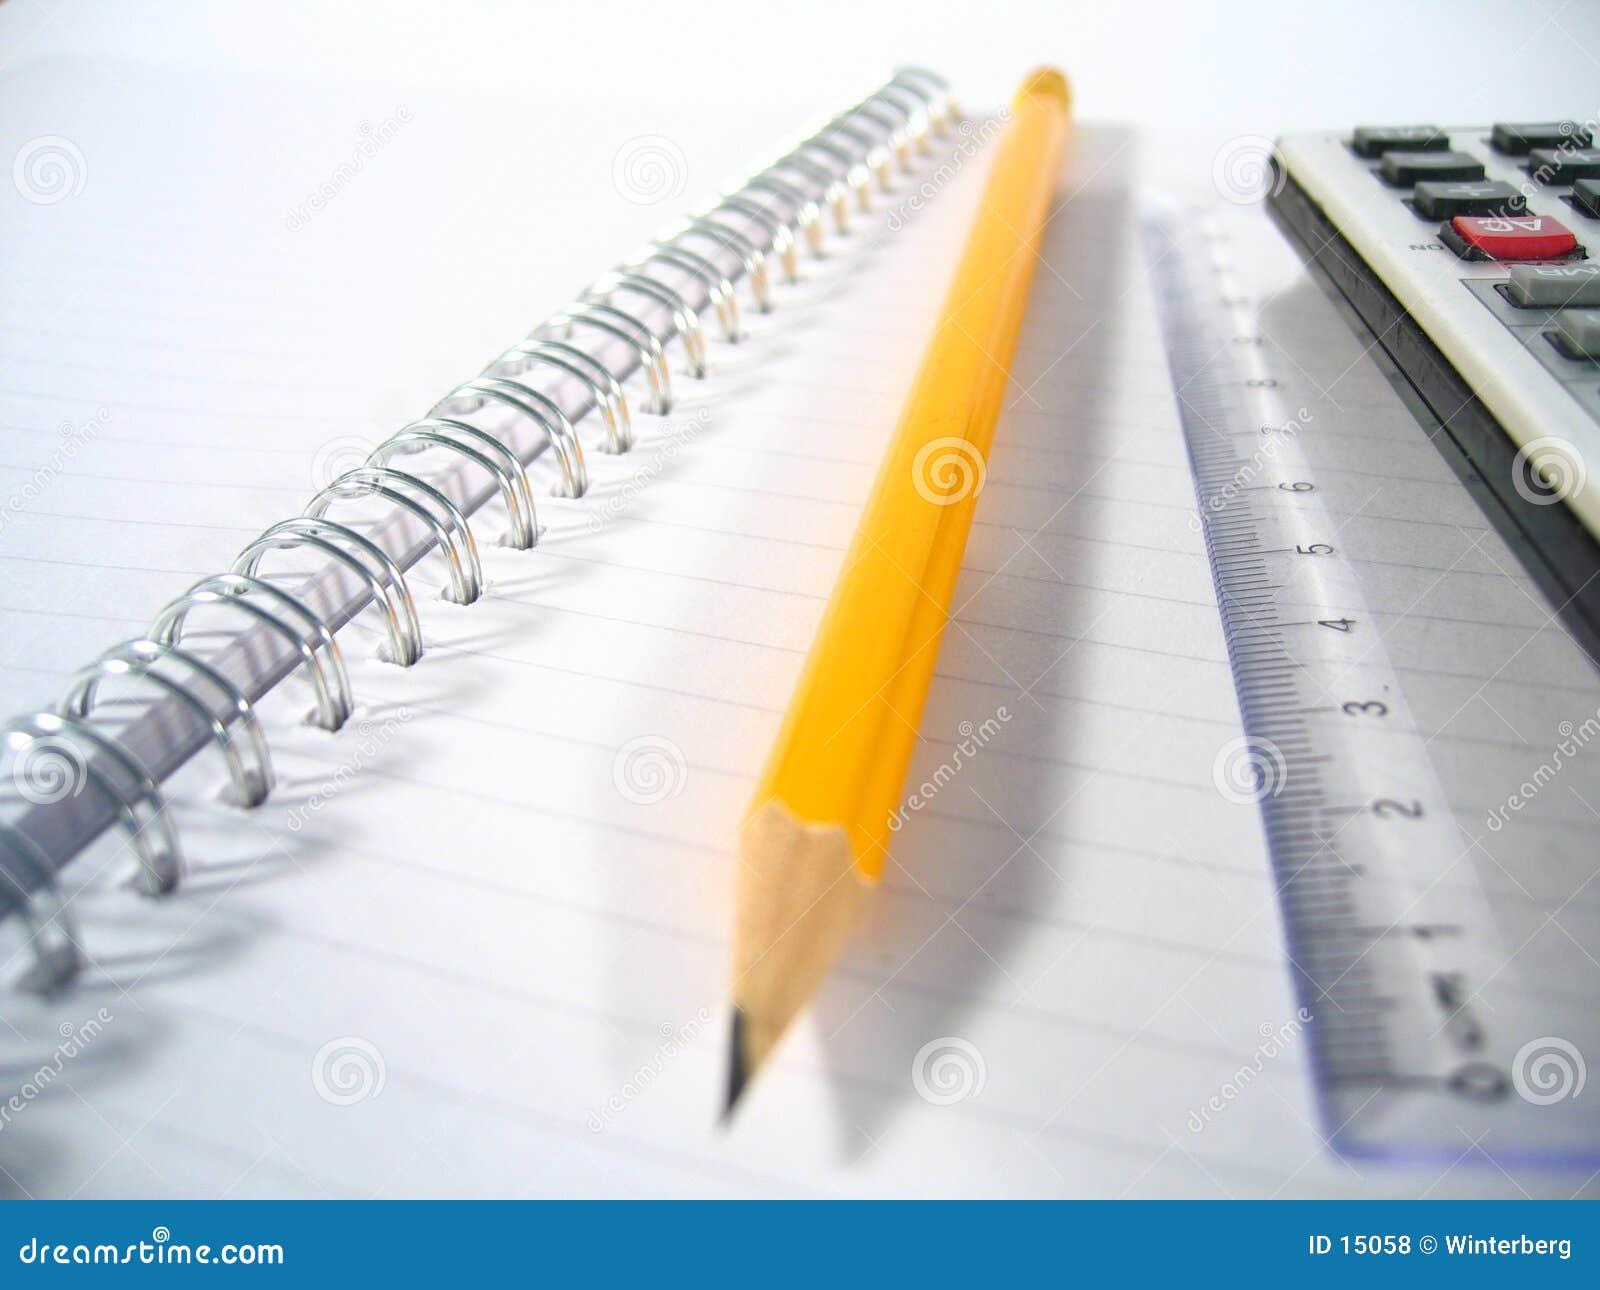 Jag pad blyertspennawriting